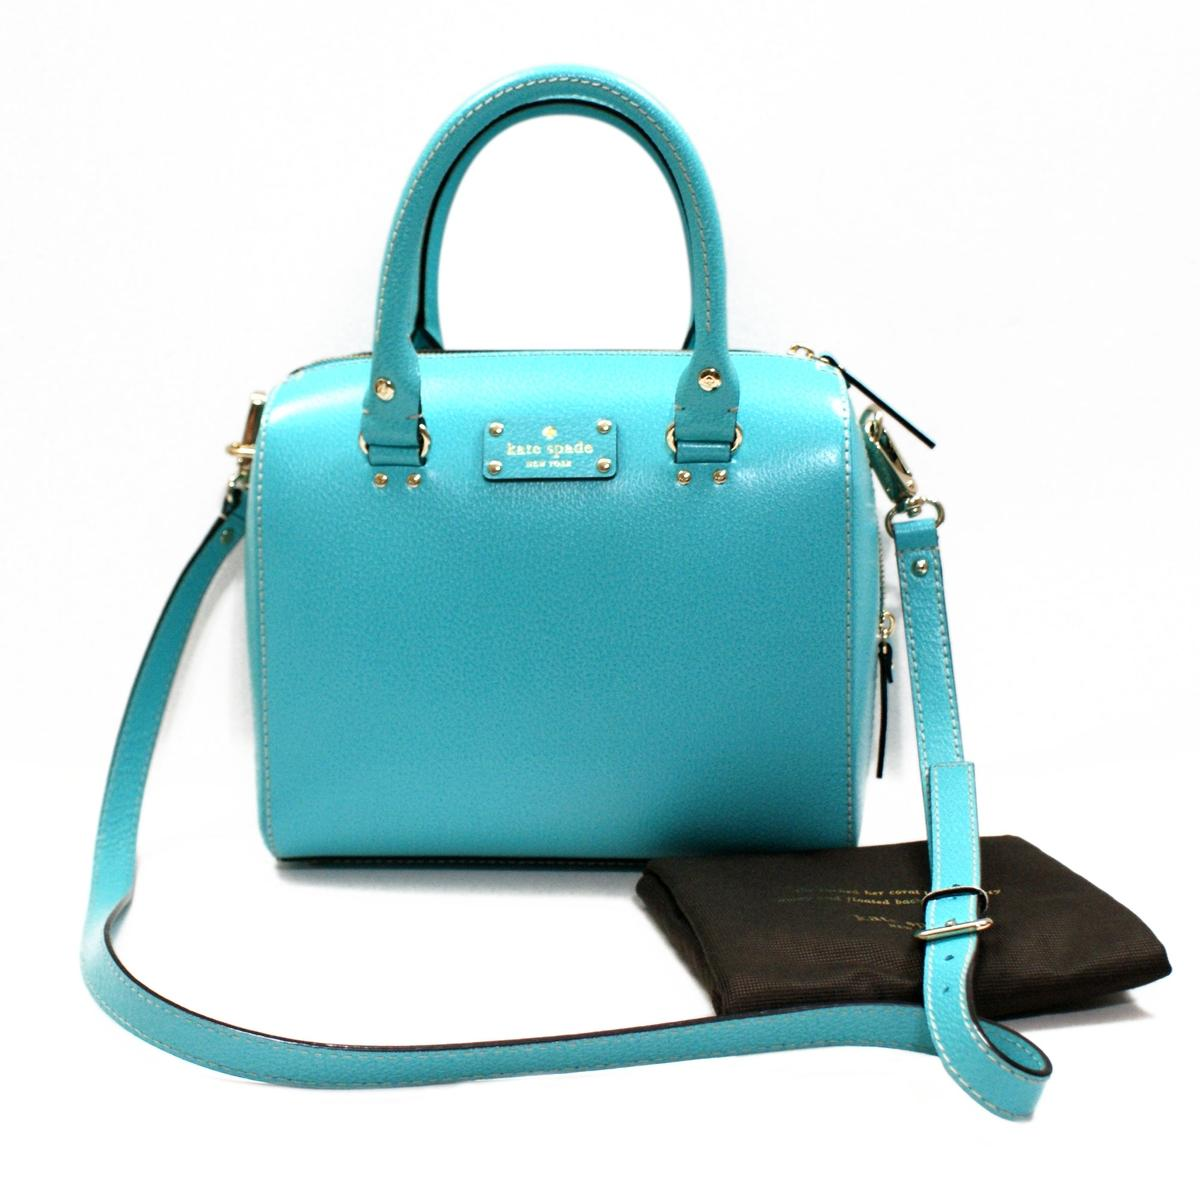 Kate Spade Alessa Wellesley Turquoise Satchel/ Handbag/ Crossbody ...